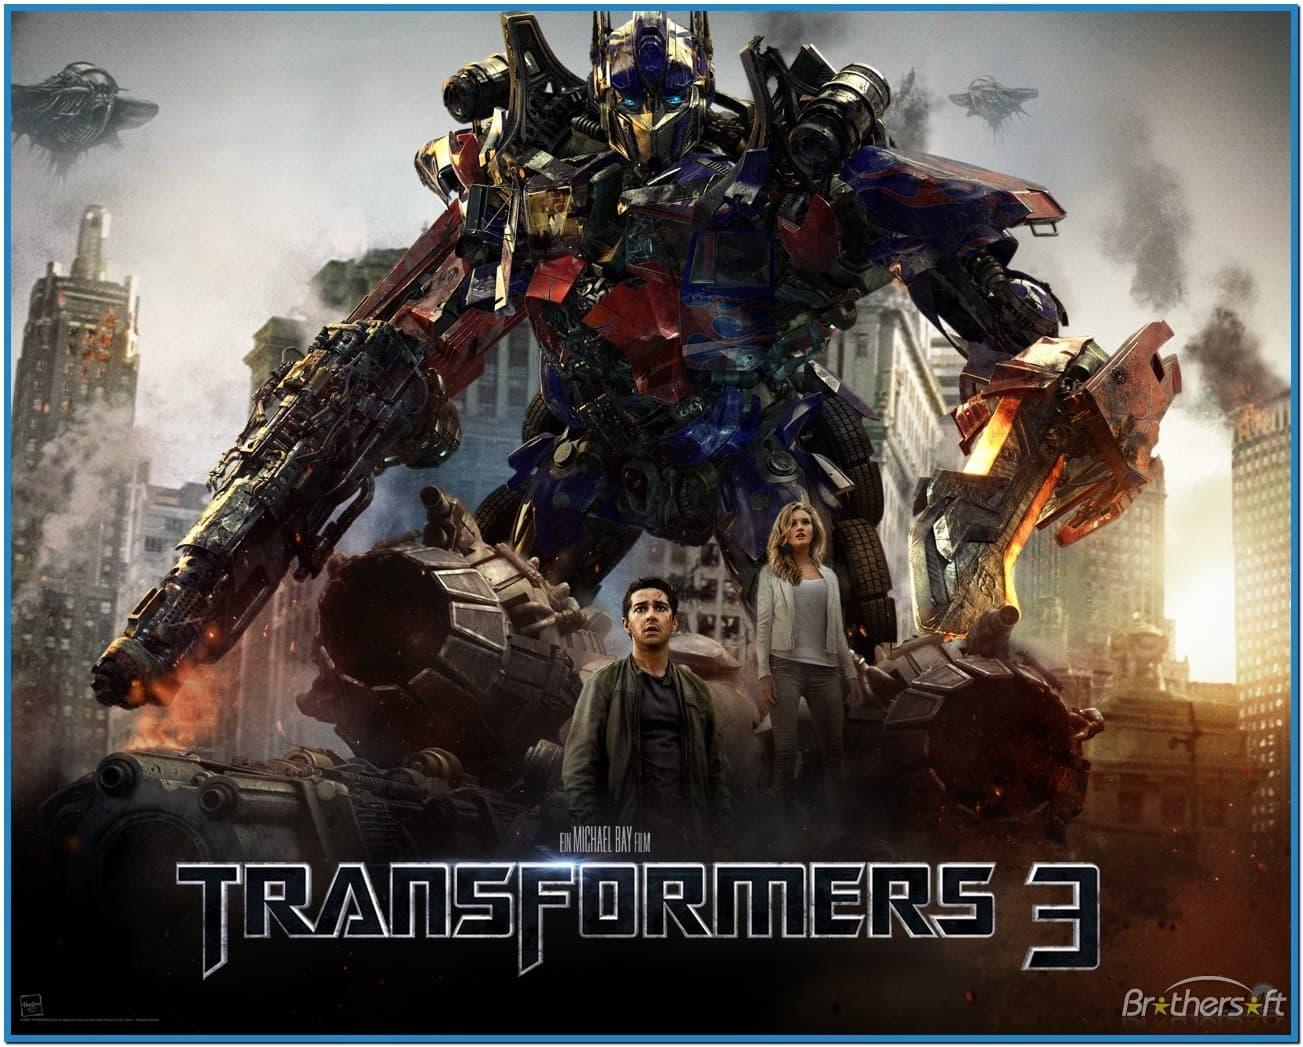 Transformers 3 screensaver mac   Download 1303x1047